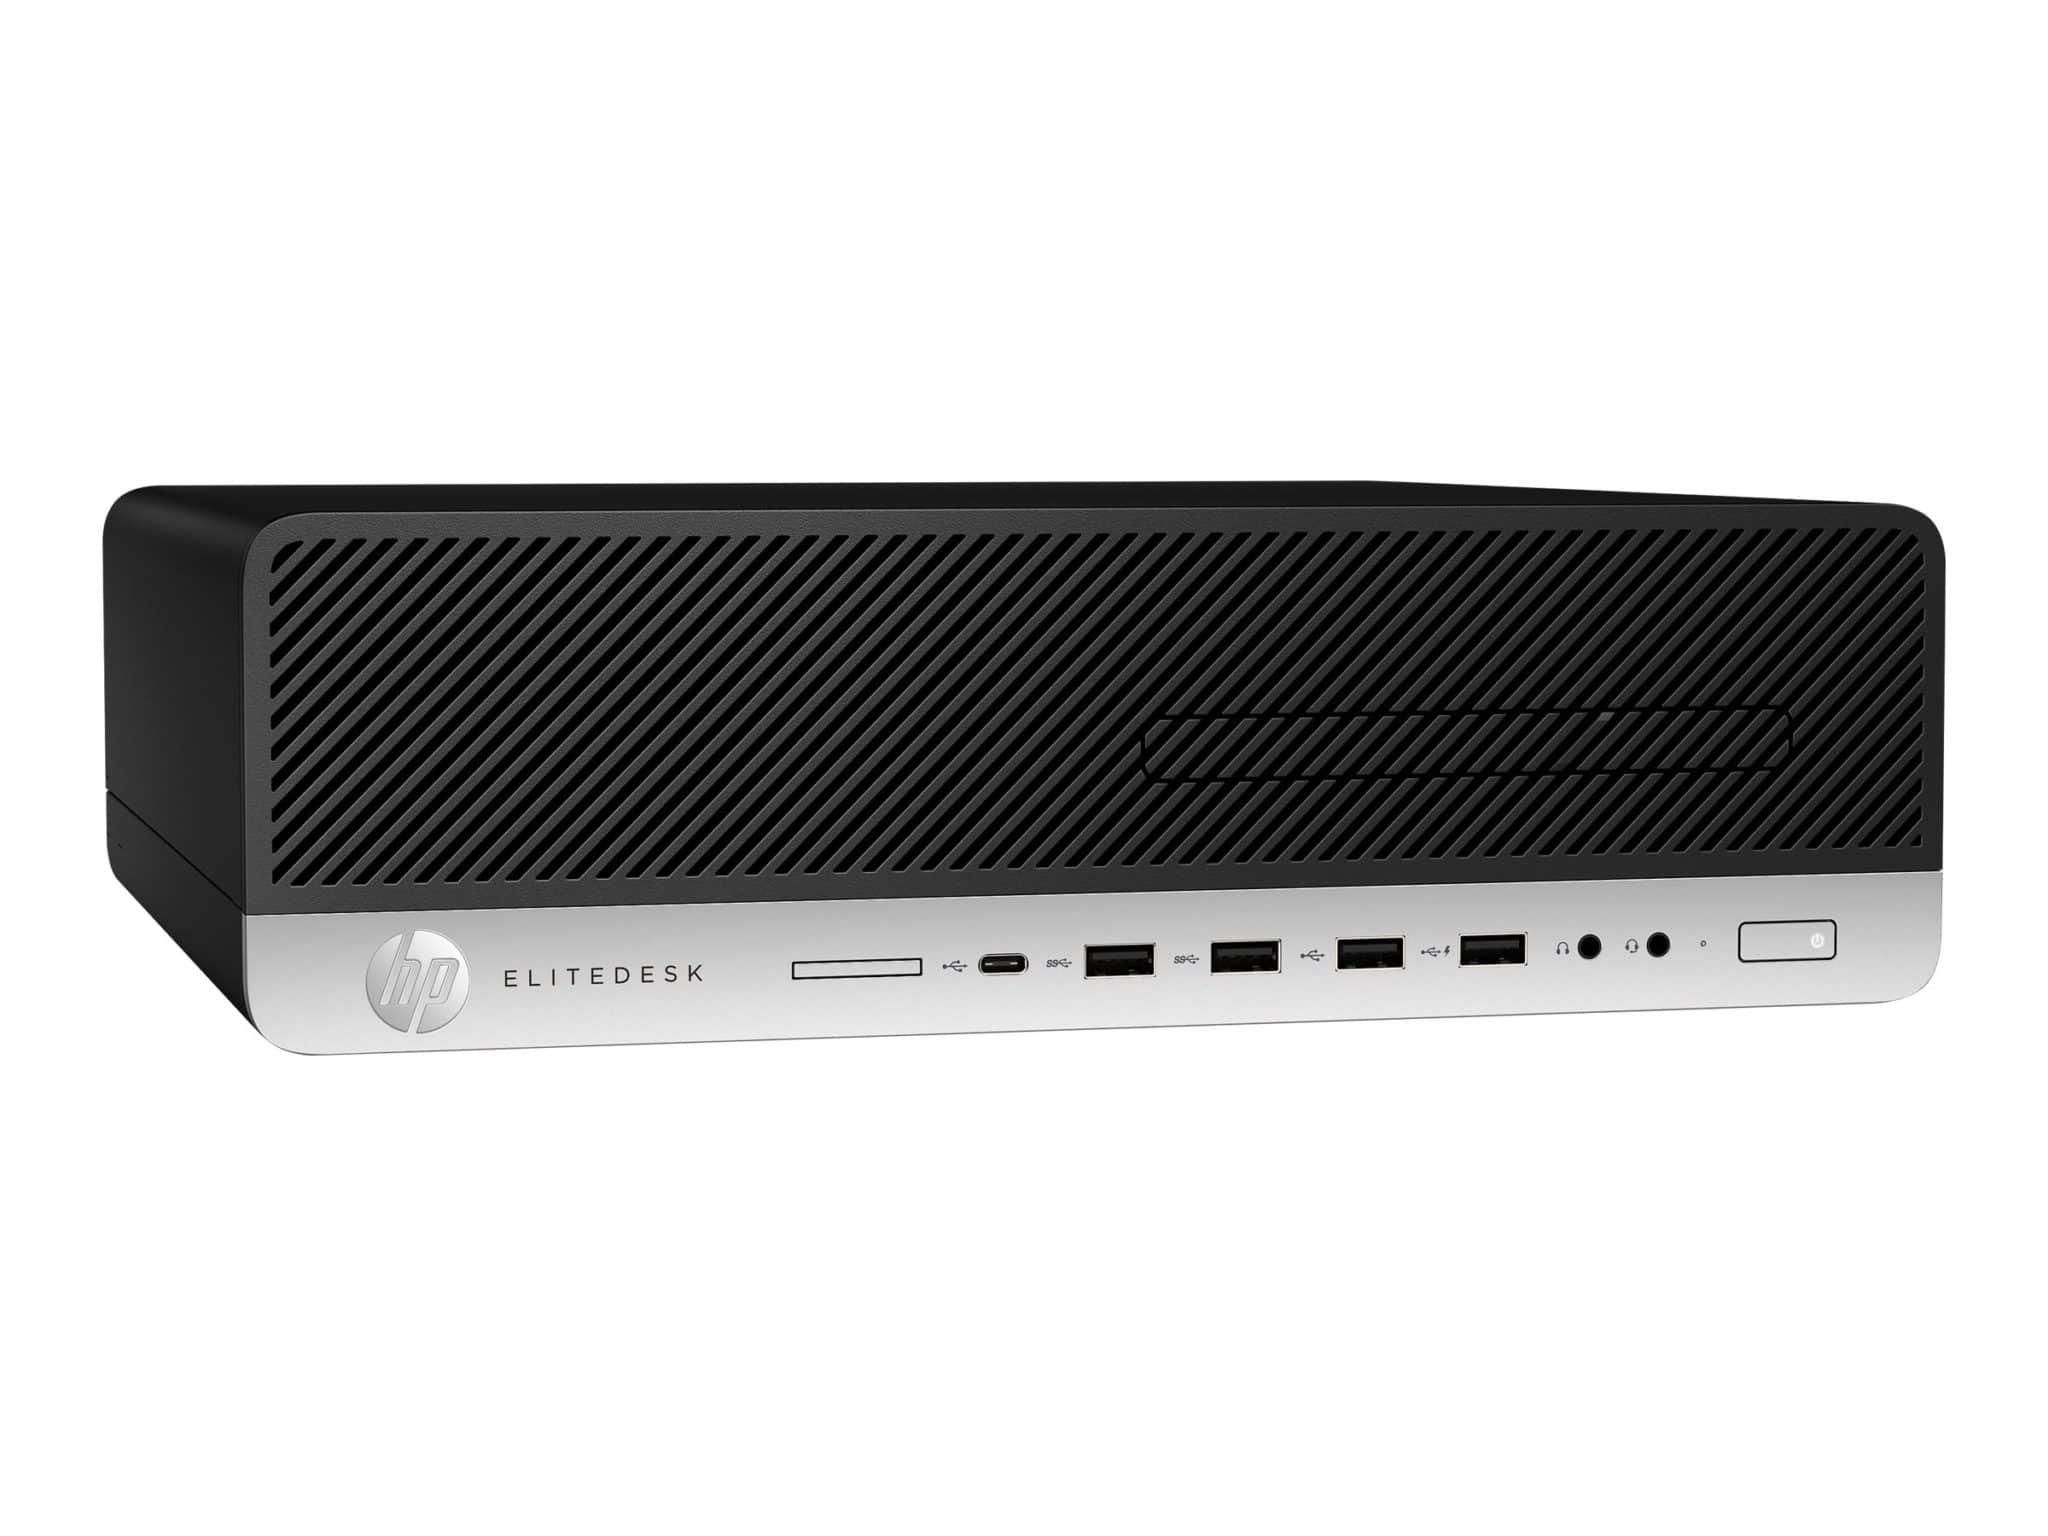 HP EliteDesk 800 G4 - Smart Buy - SFF - Core i5 8500 3 GHz - 8 GB - 512 GB - Desktop